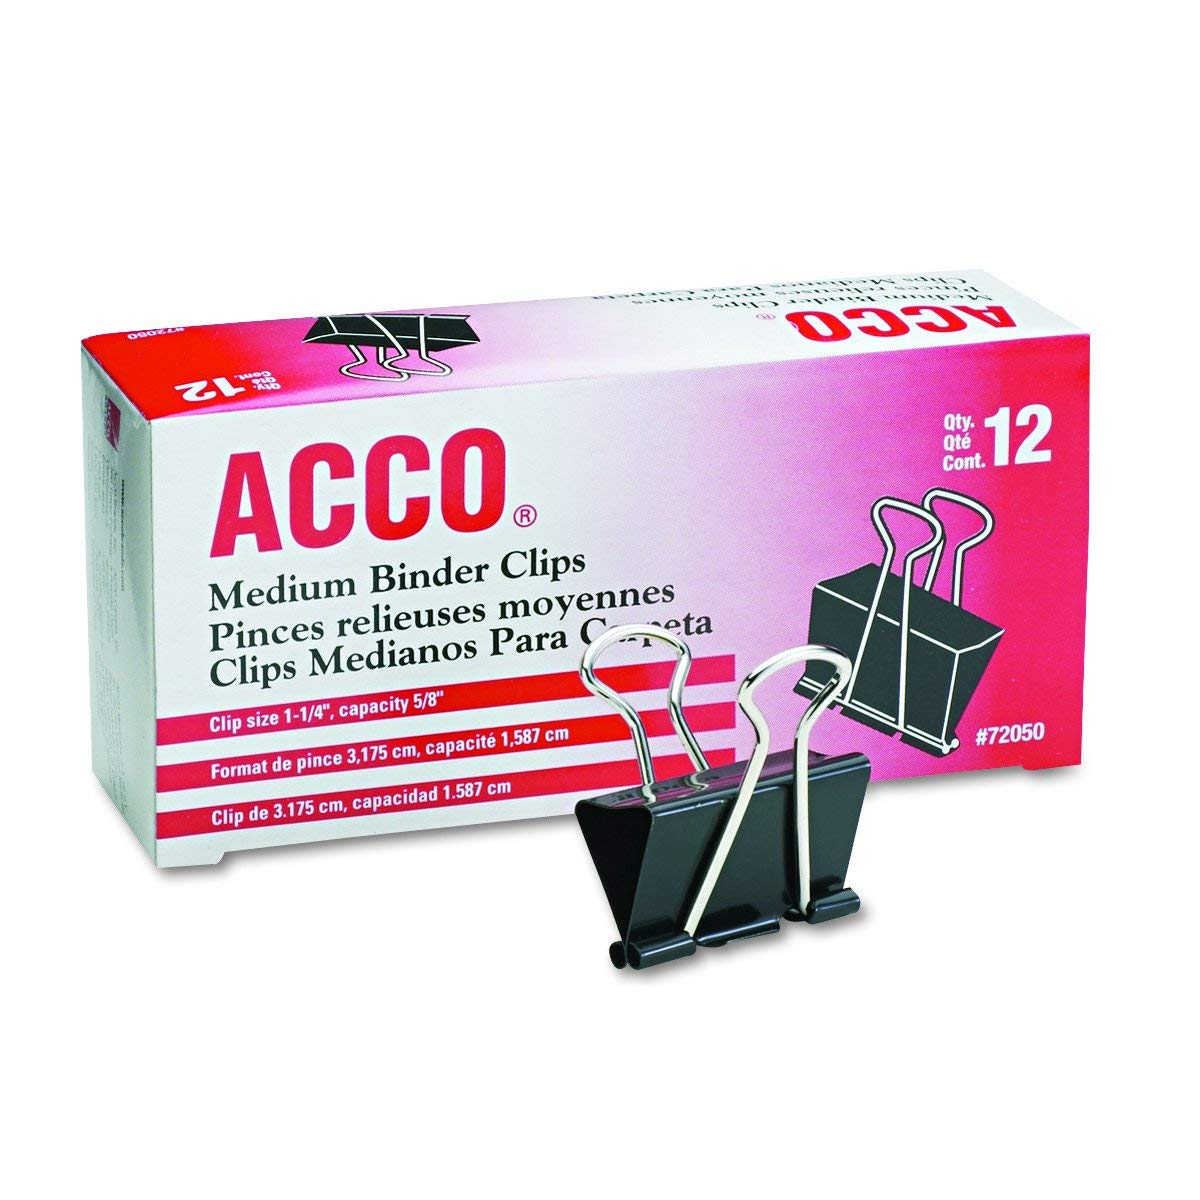 ACCO Binder Clips, Medium, 1 Box, 12 Clips/Box (72050), Pack of 10